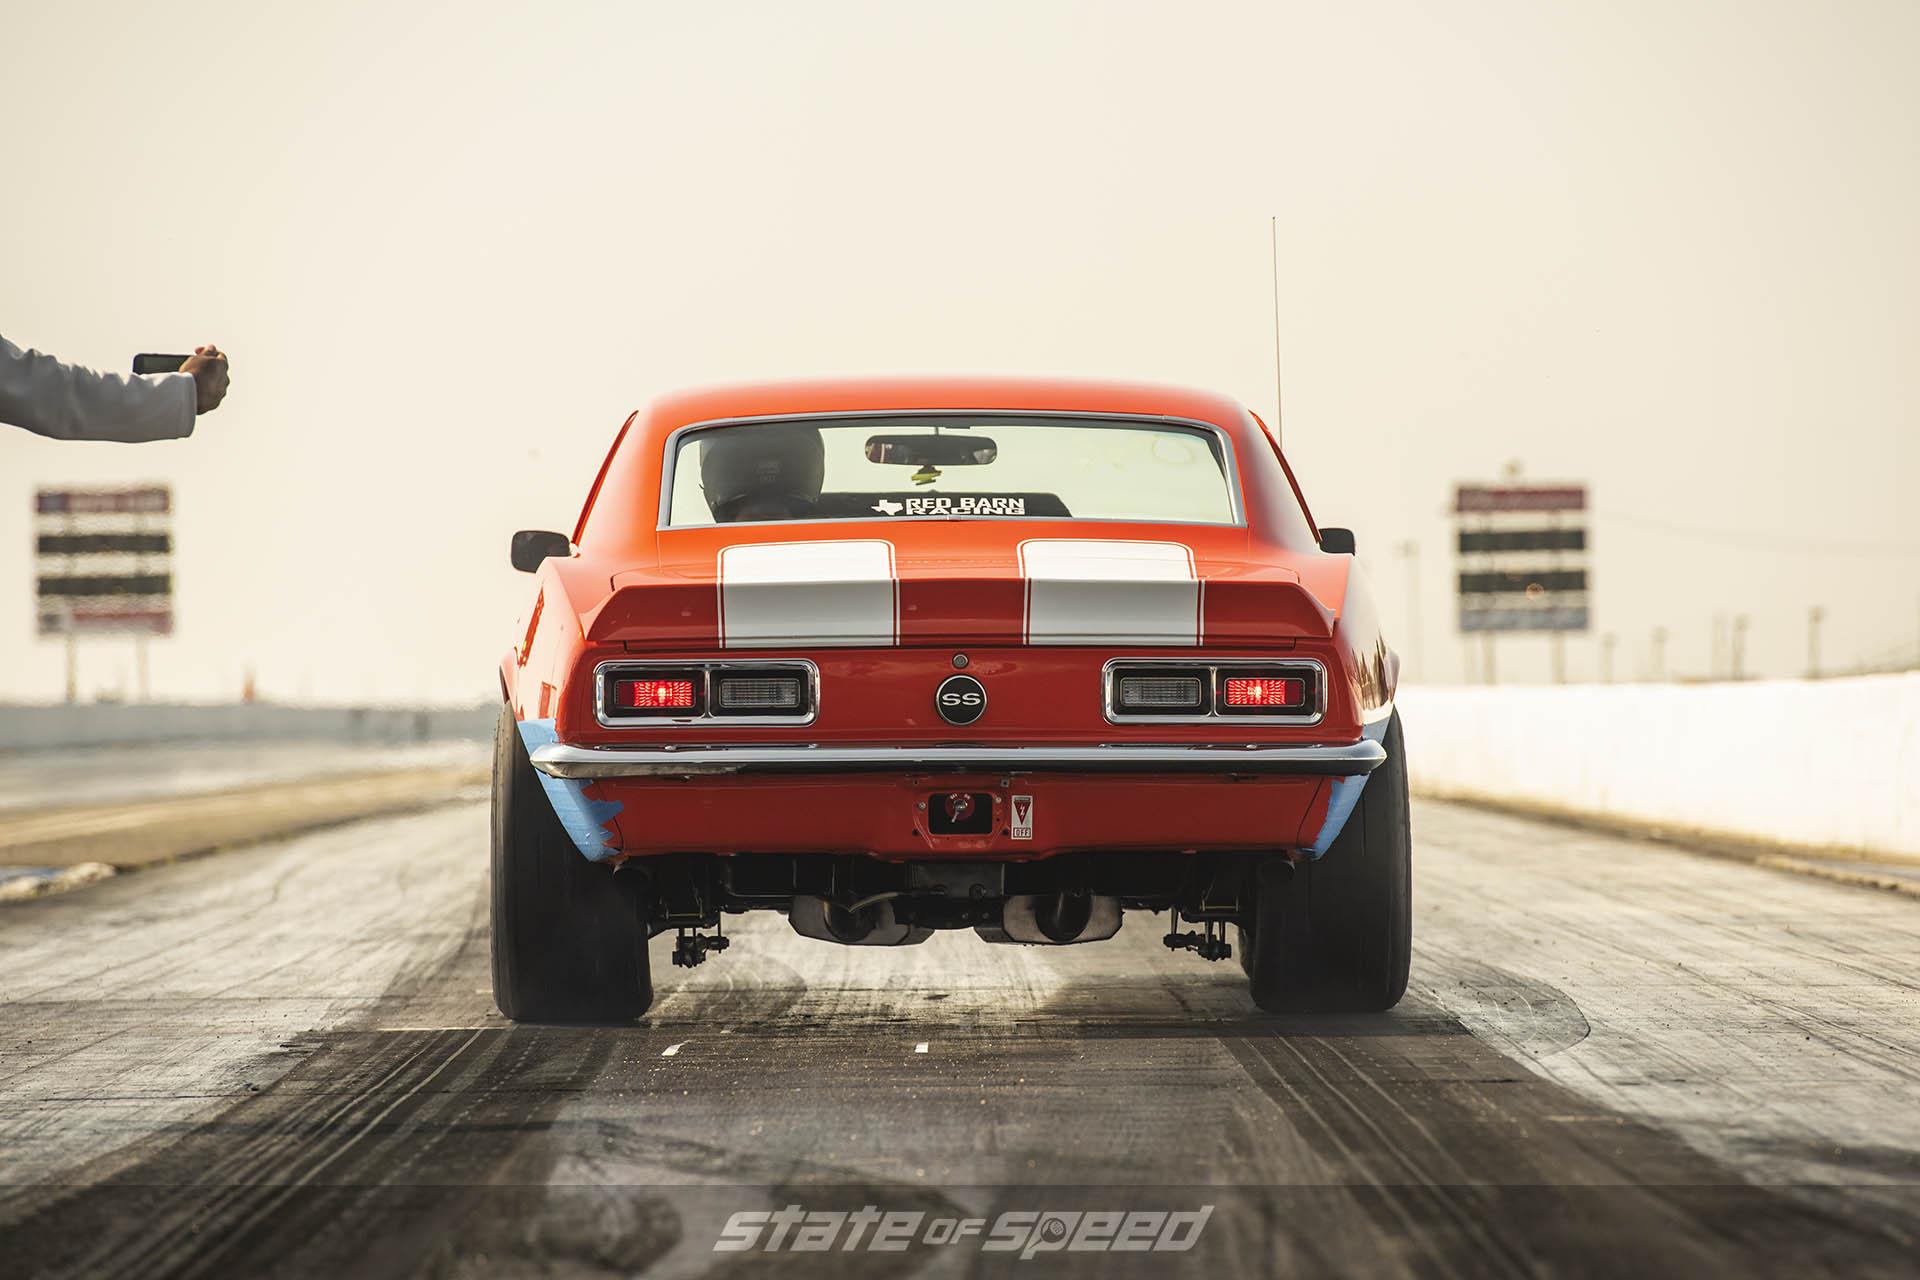 Chevy Camaro on the drag strip